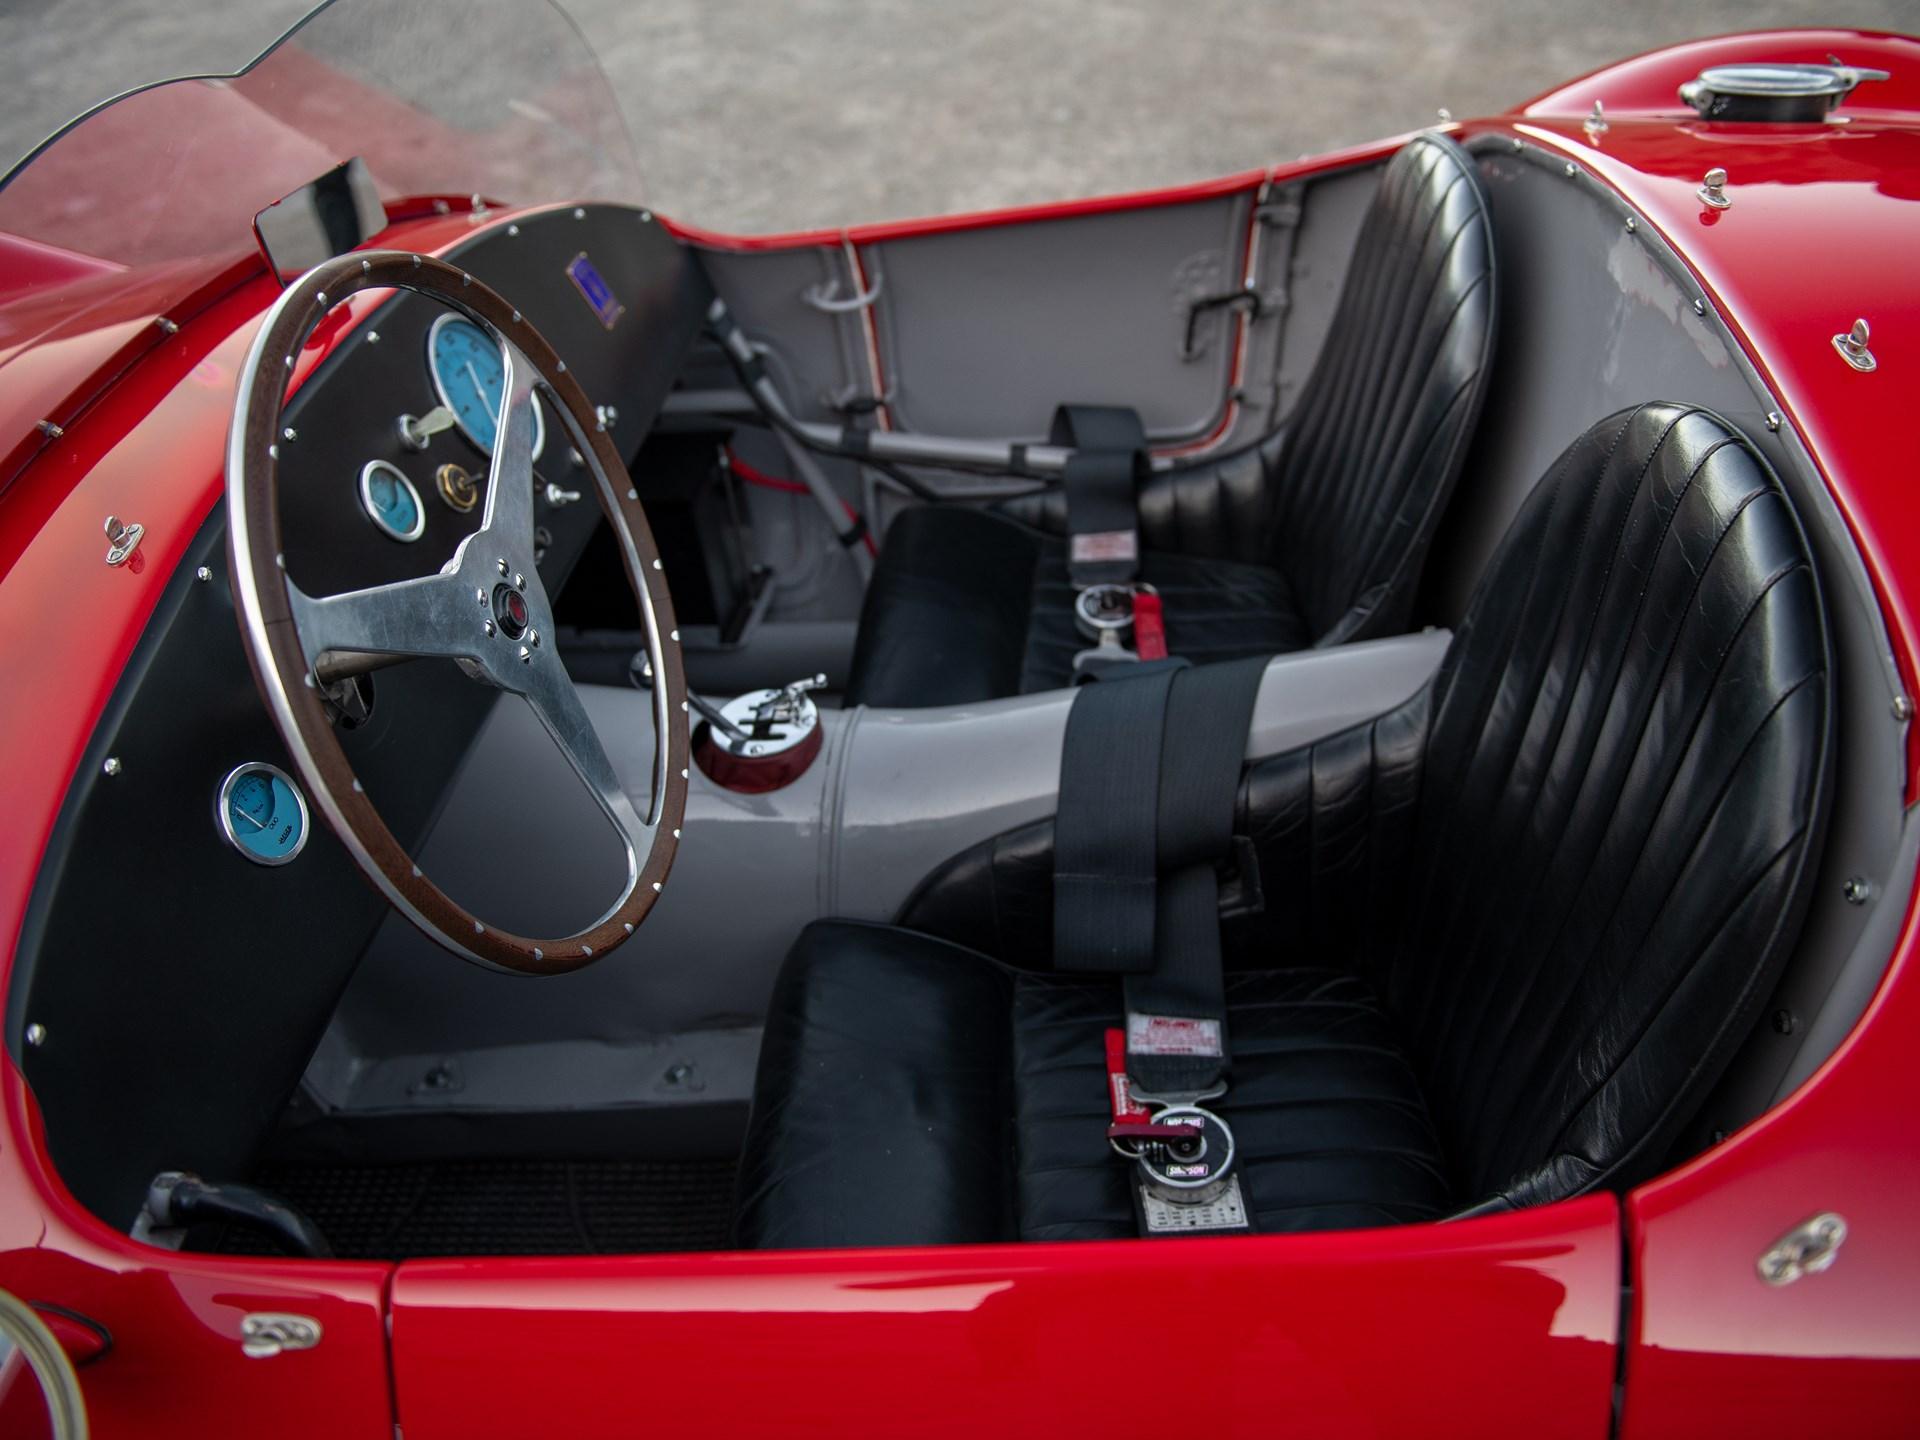 1954 Maserati A6GCS by Fiandri & Malagoli interior